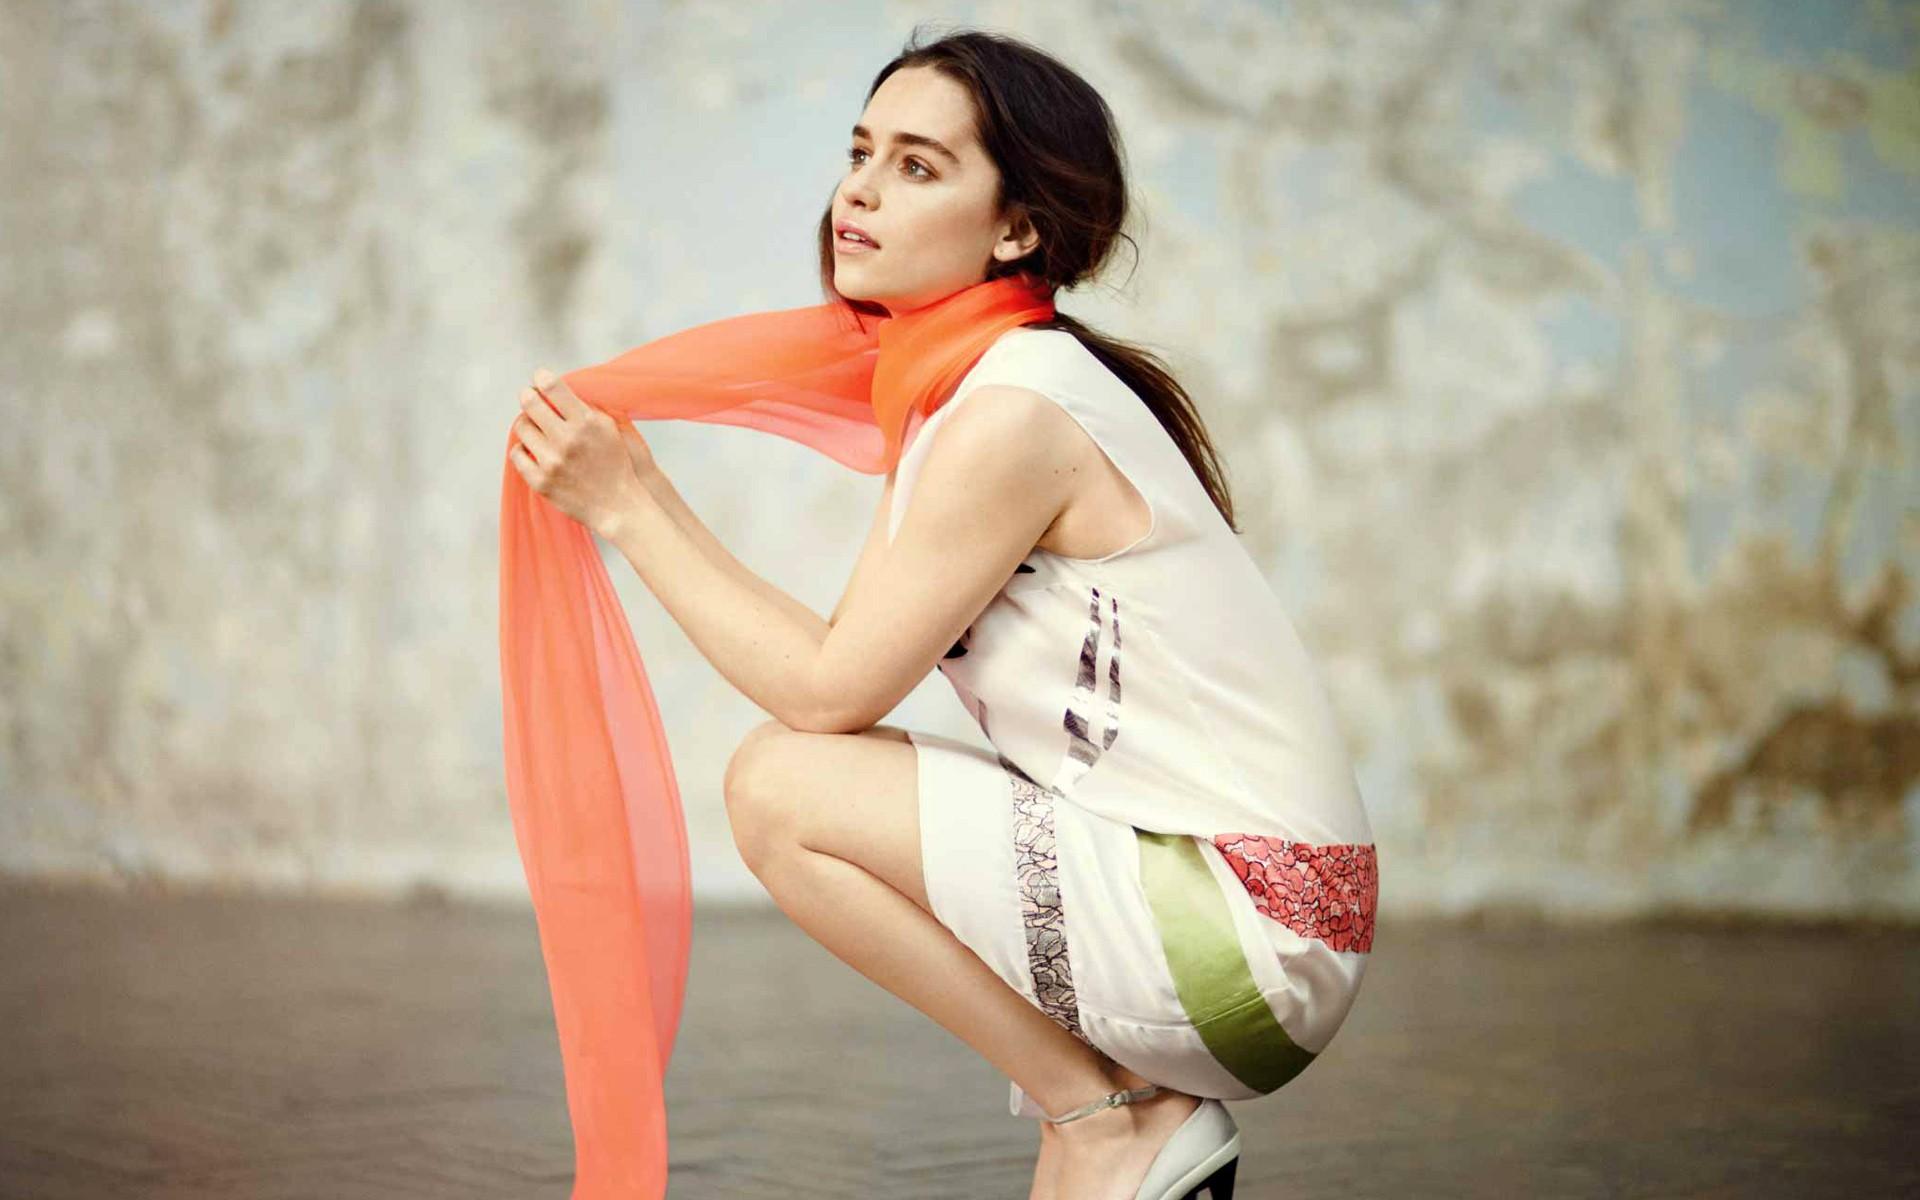 emilia clarke vogue hd celebrities 4k wallpapers images